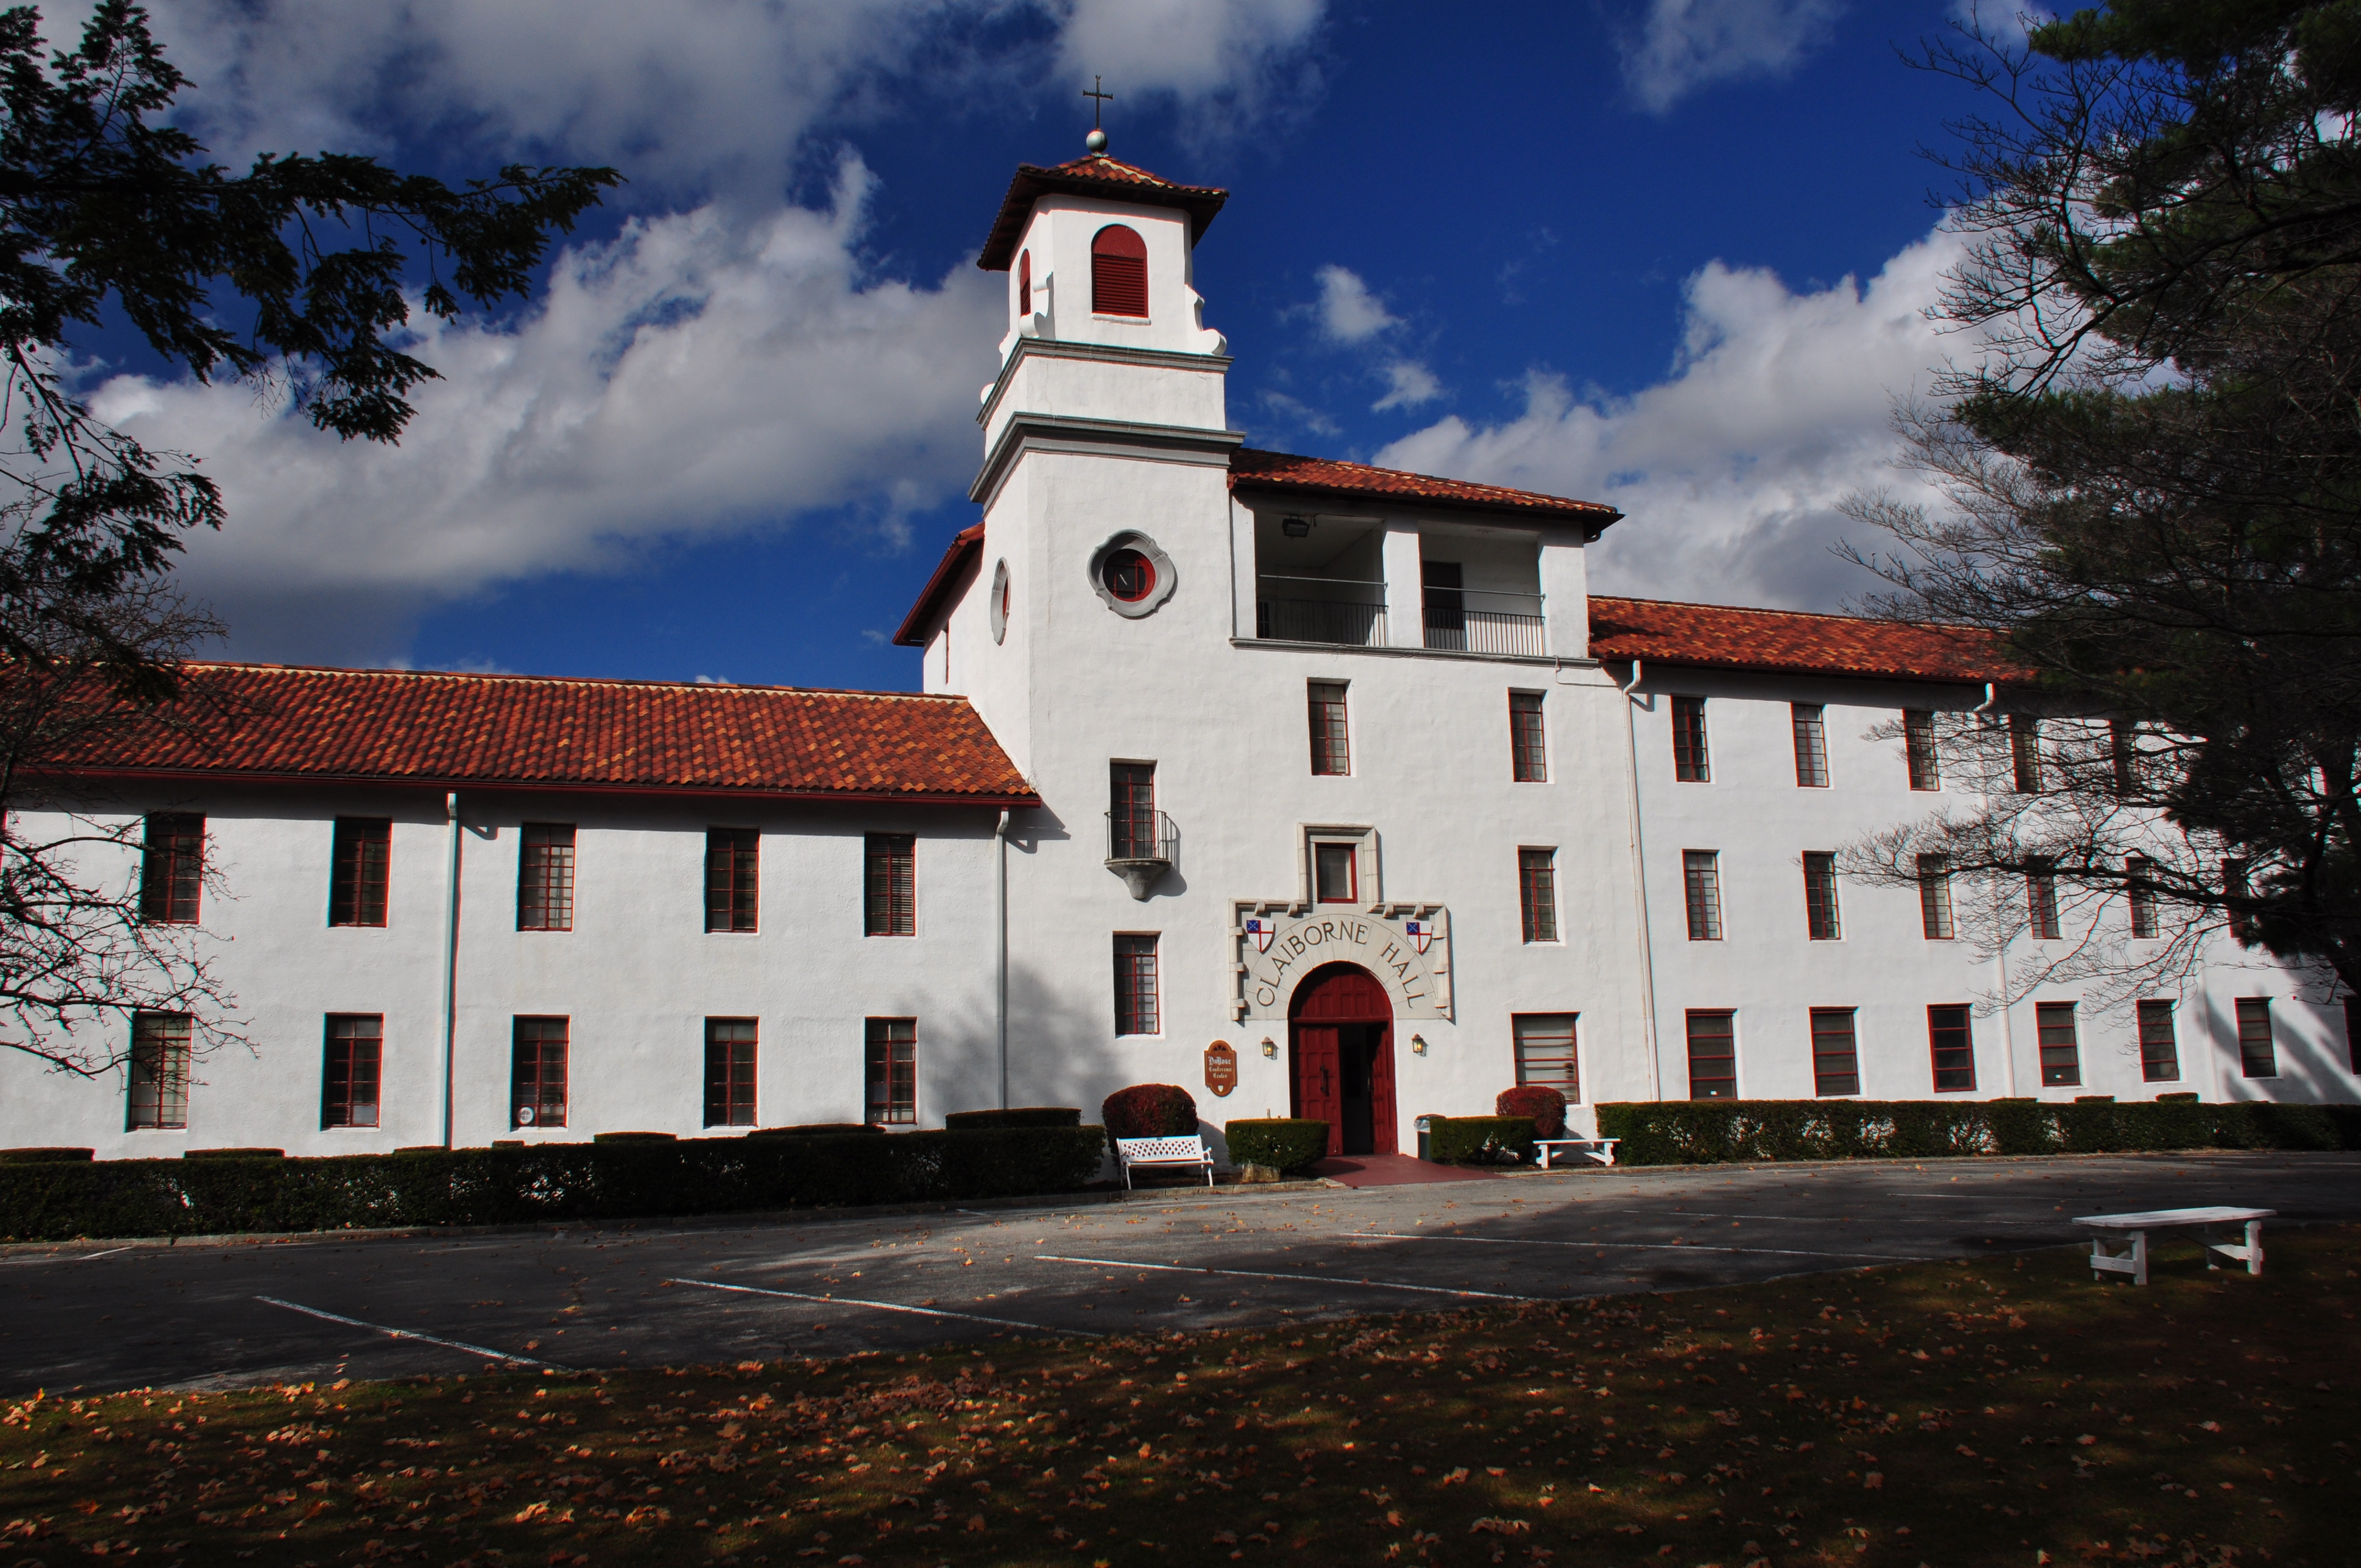 DuBose Conference Center - Wikipedia